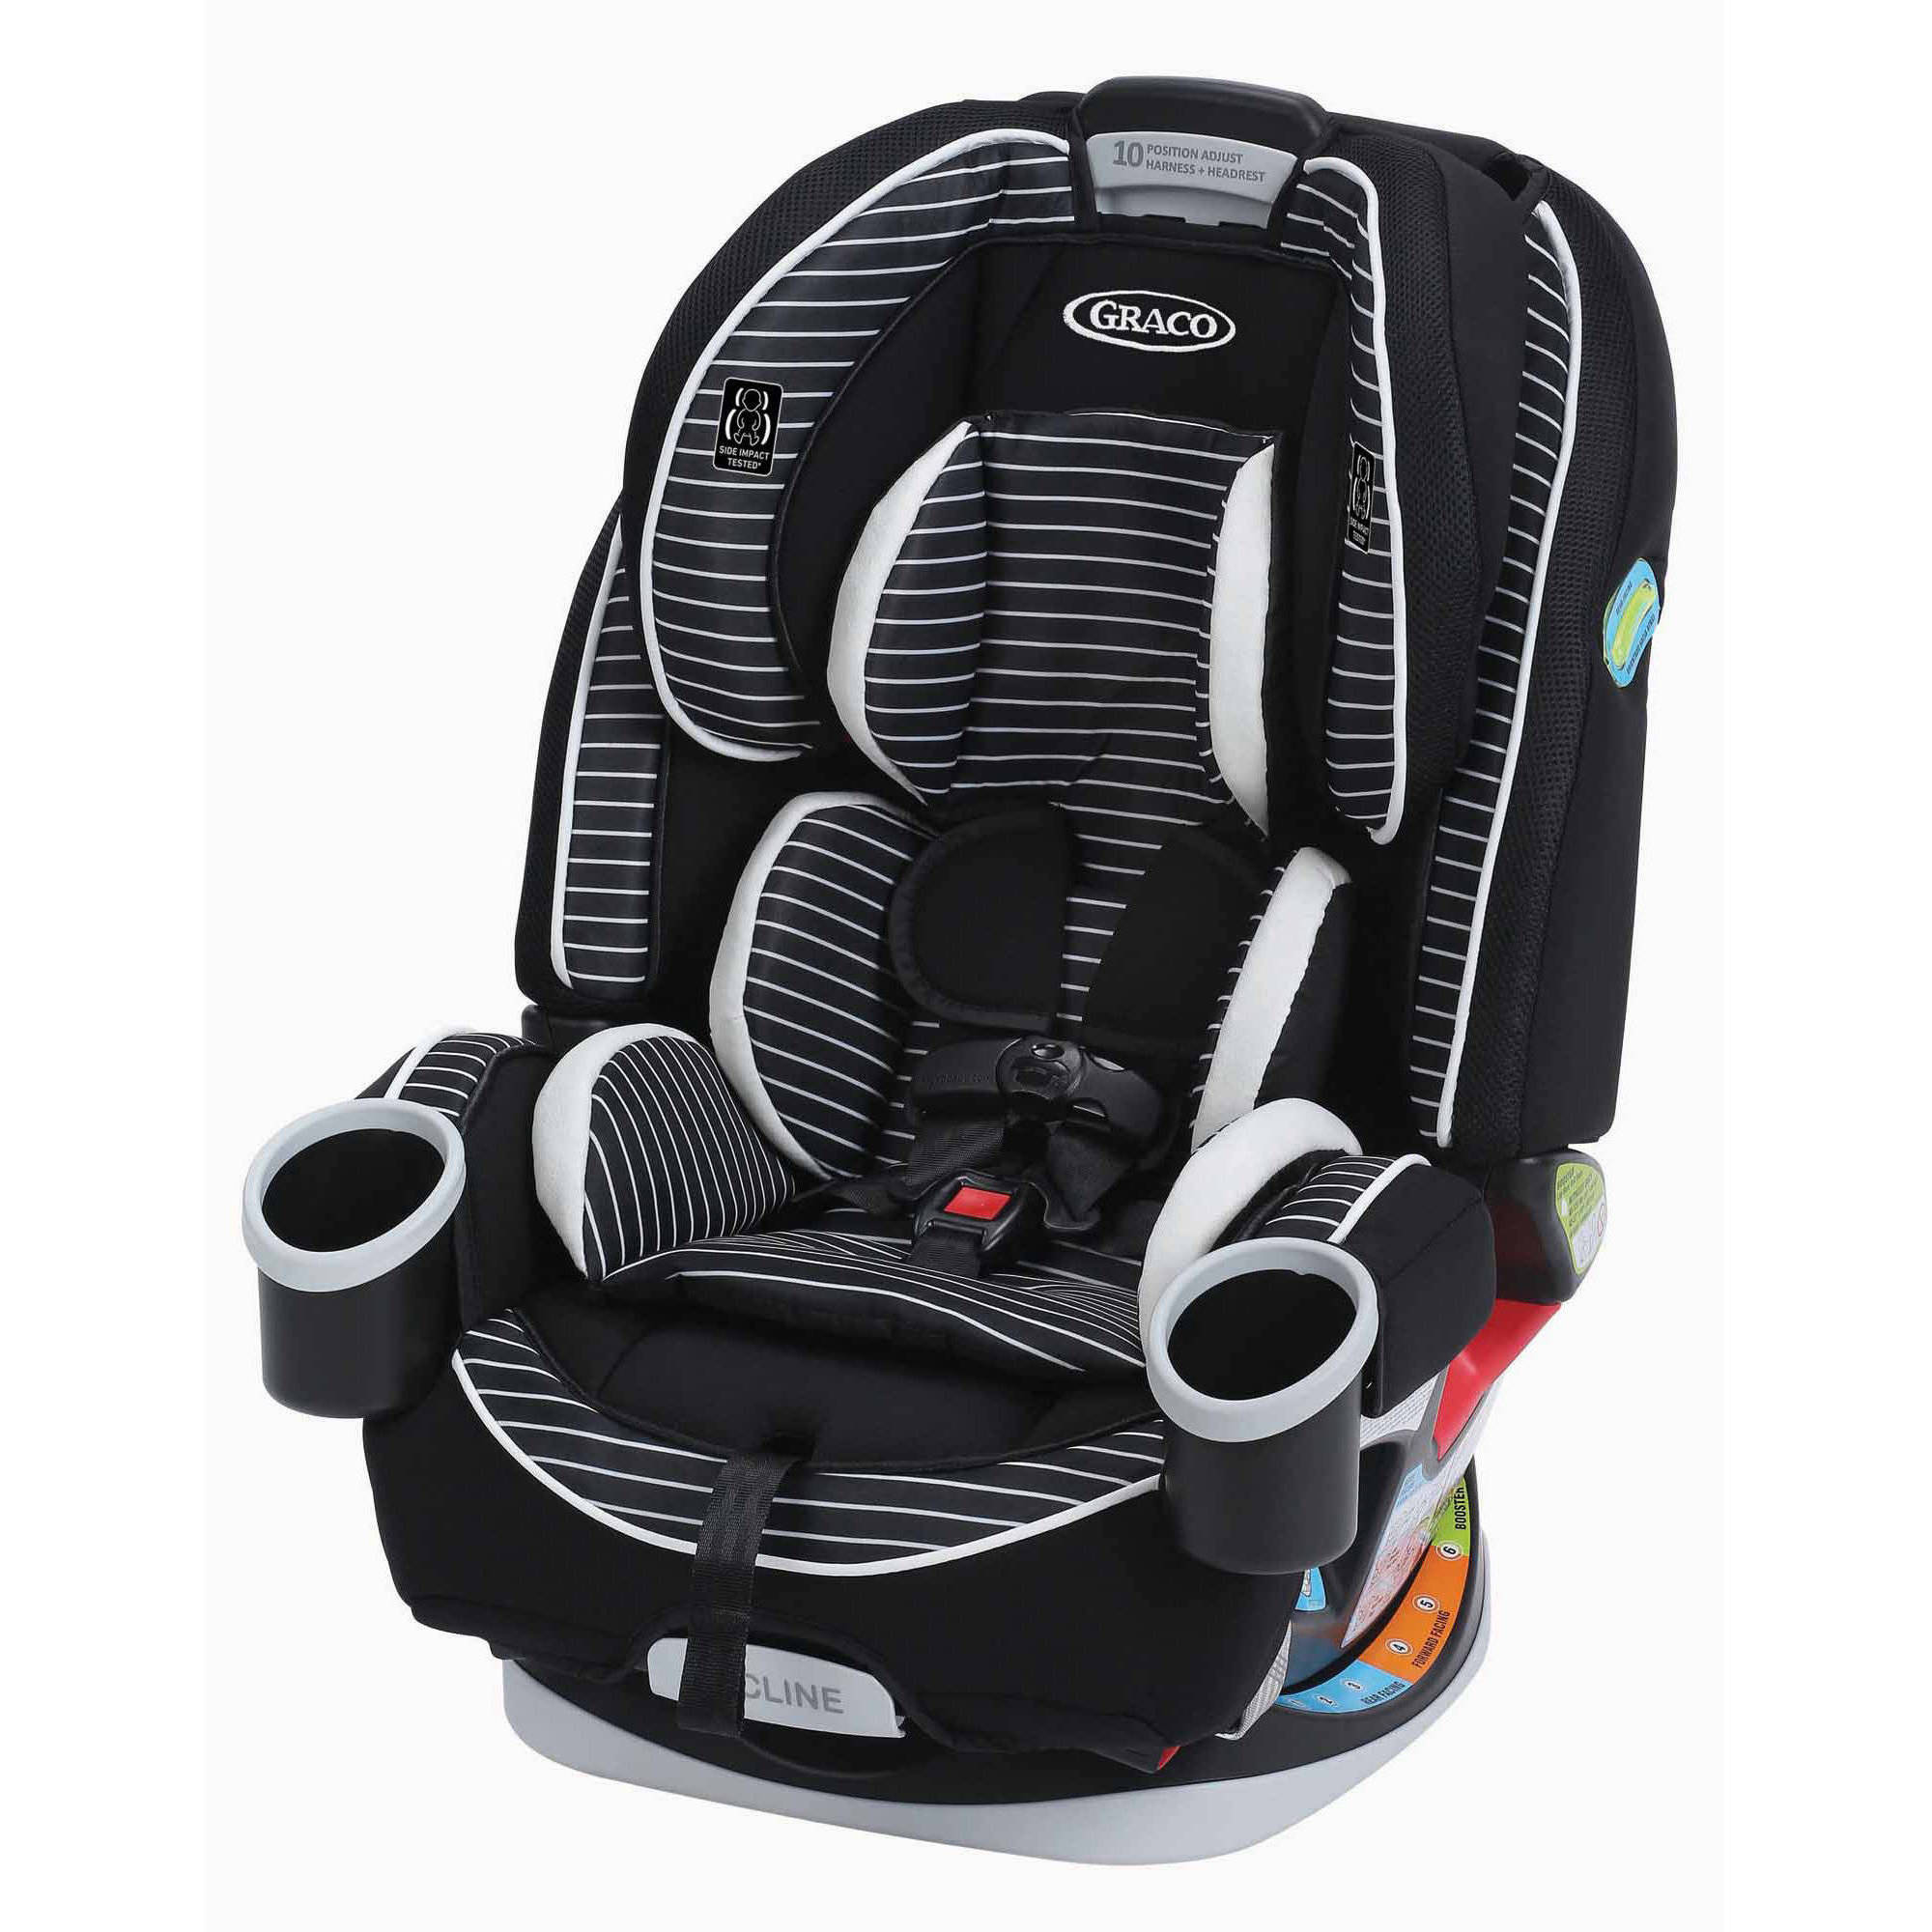 Graco 4Ever All-in-1 Convertible Car Seat, Studio